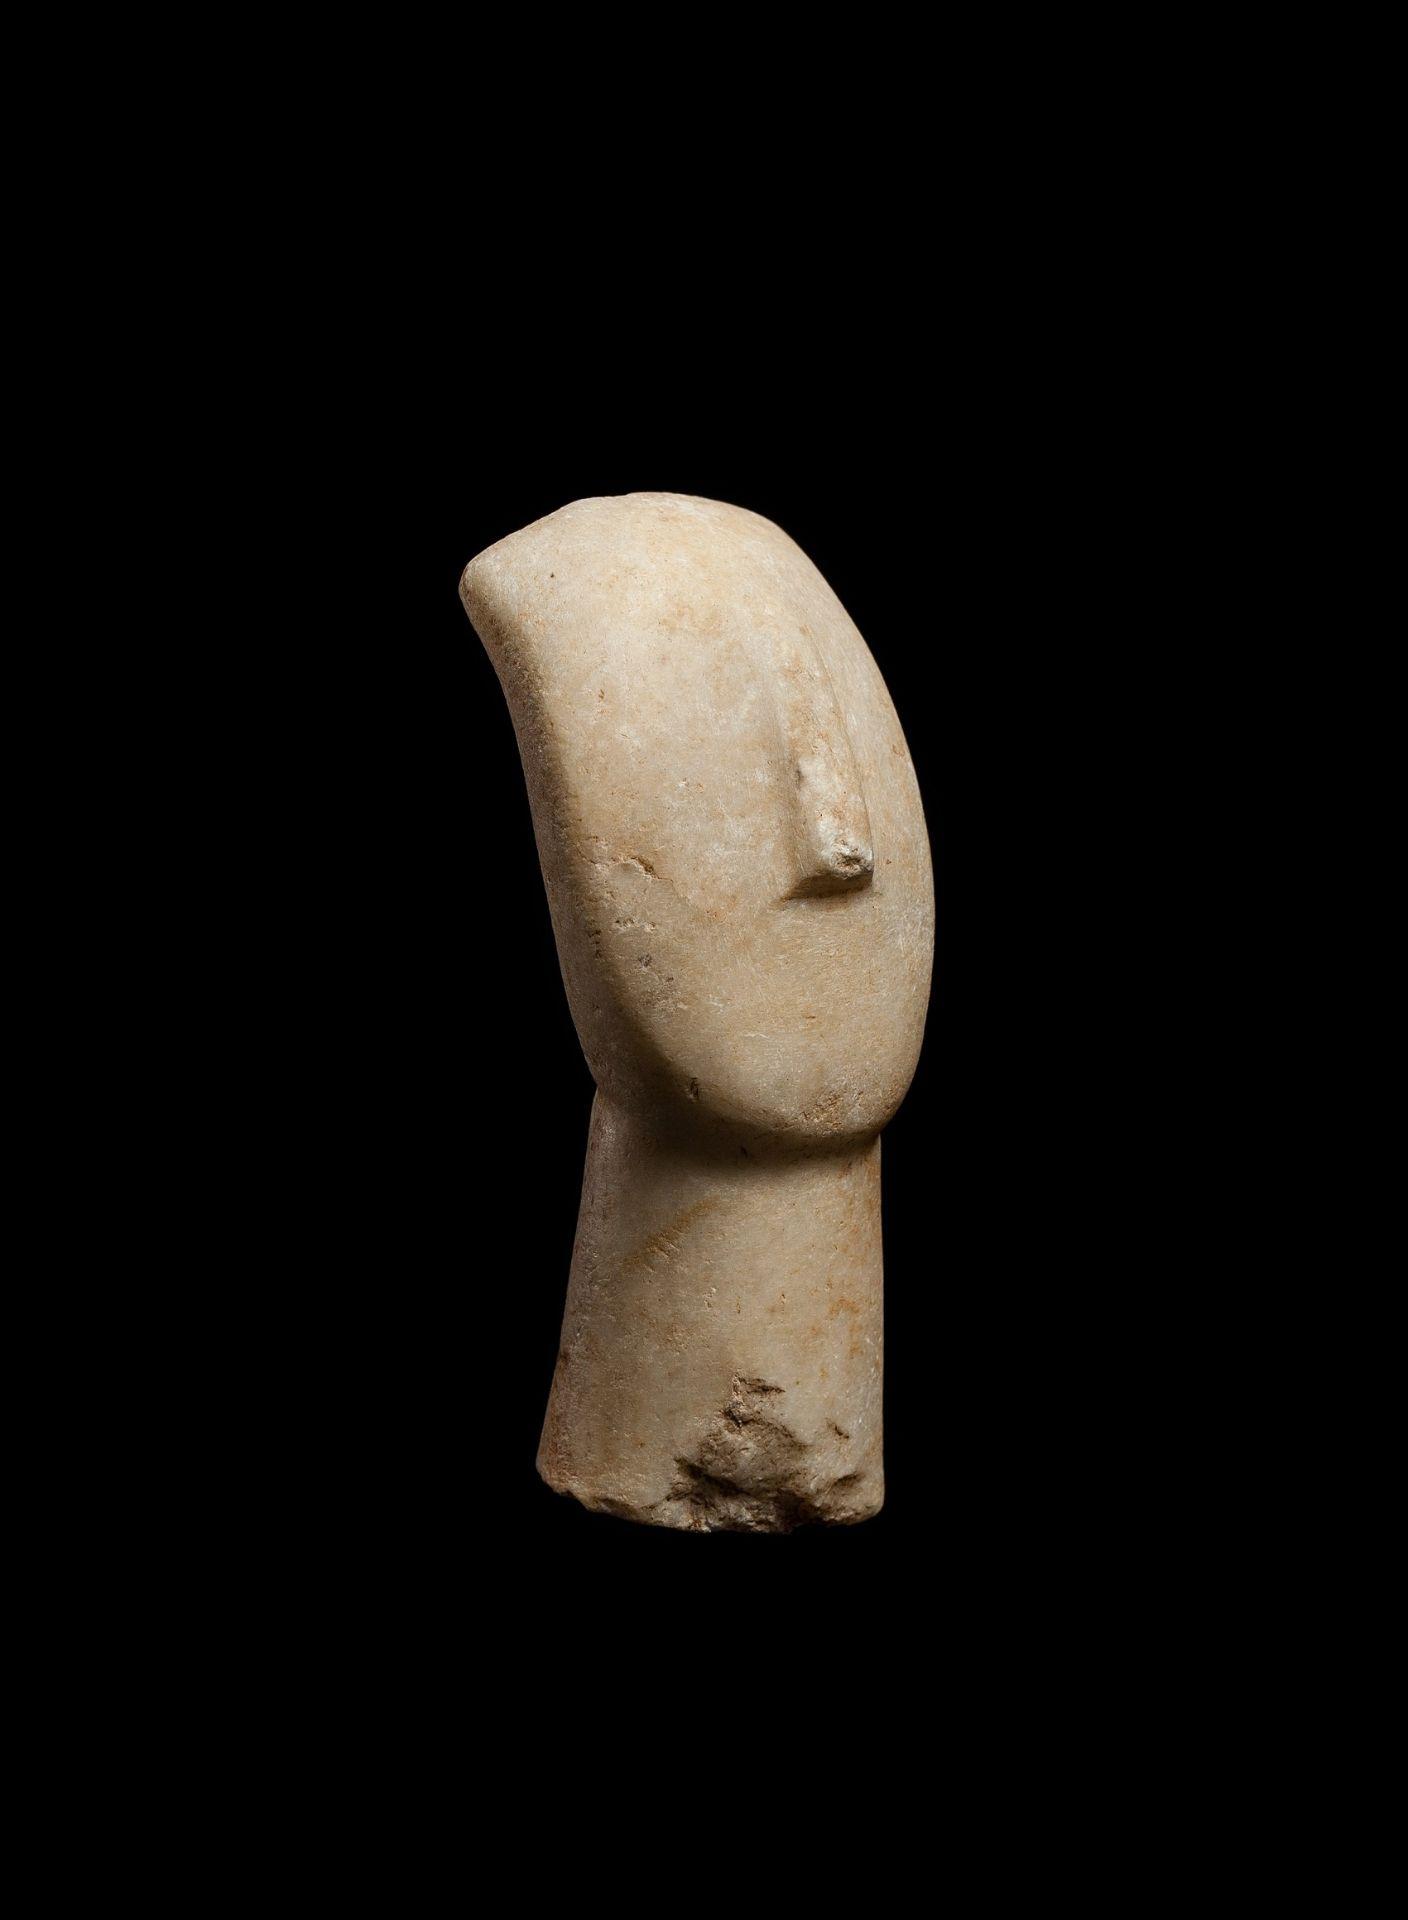 CYCLADIC IDOL HEAD CYCLADES, EARLY CYCLADIC II, C. 2600 - 2400 B.C. - Image 2 of 6